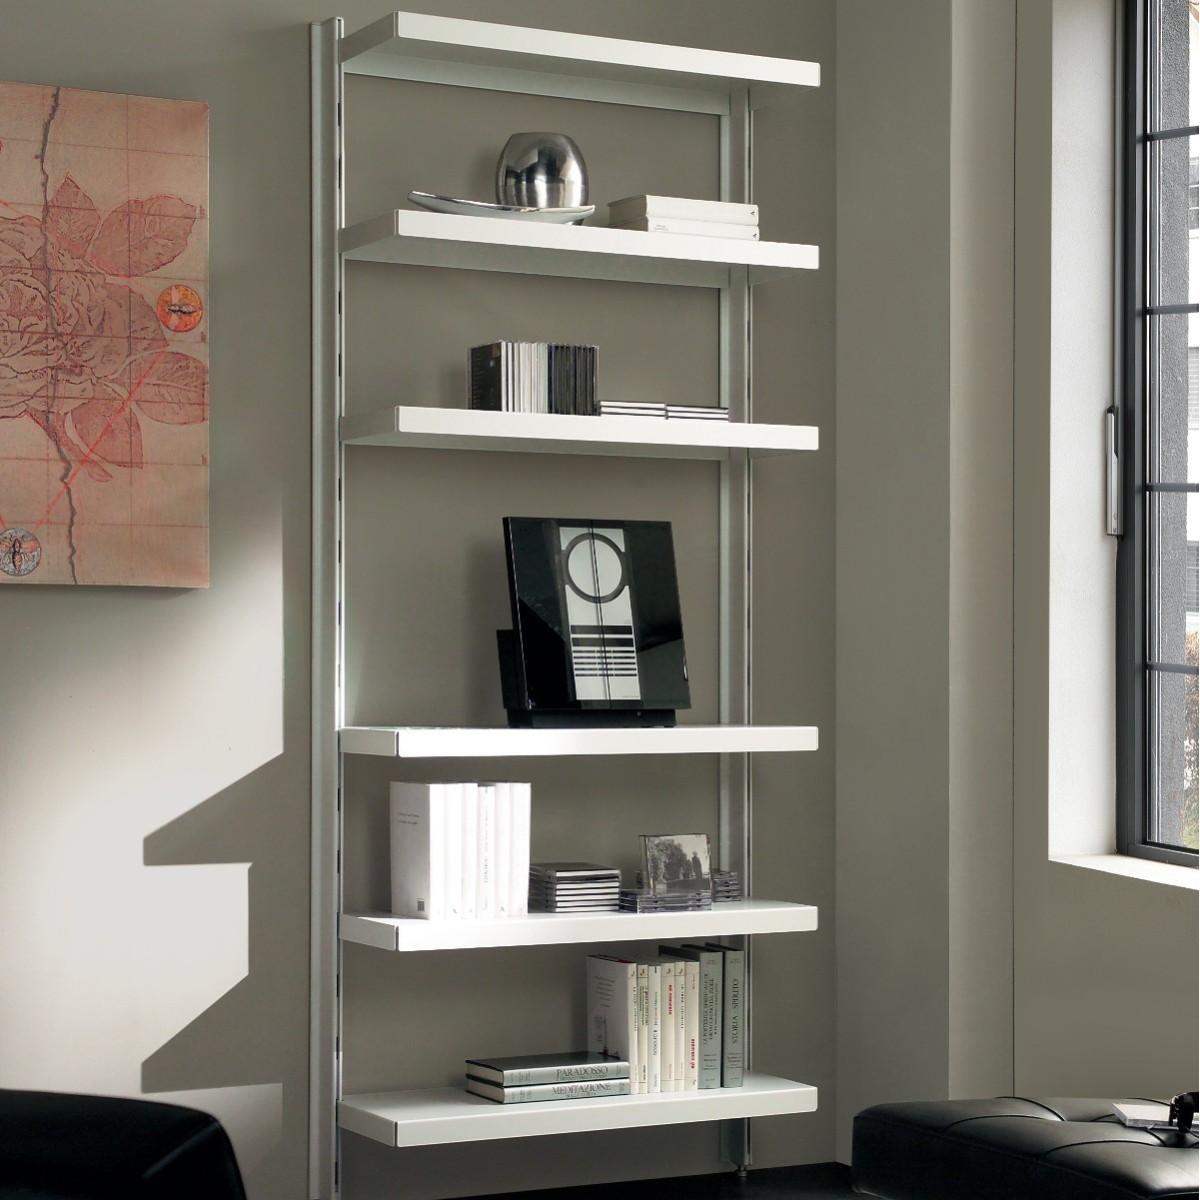 Scaffale in metallo nolan a muro in acciaio bianco 85 x 32 for Libreria acciaio e vetro